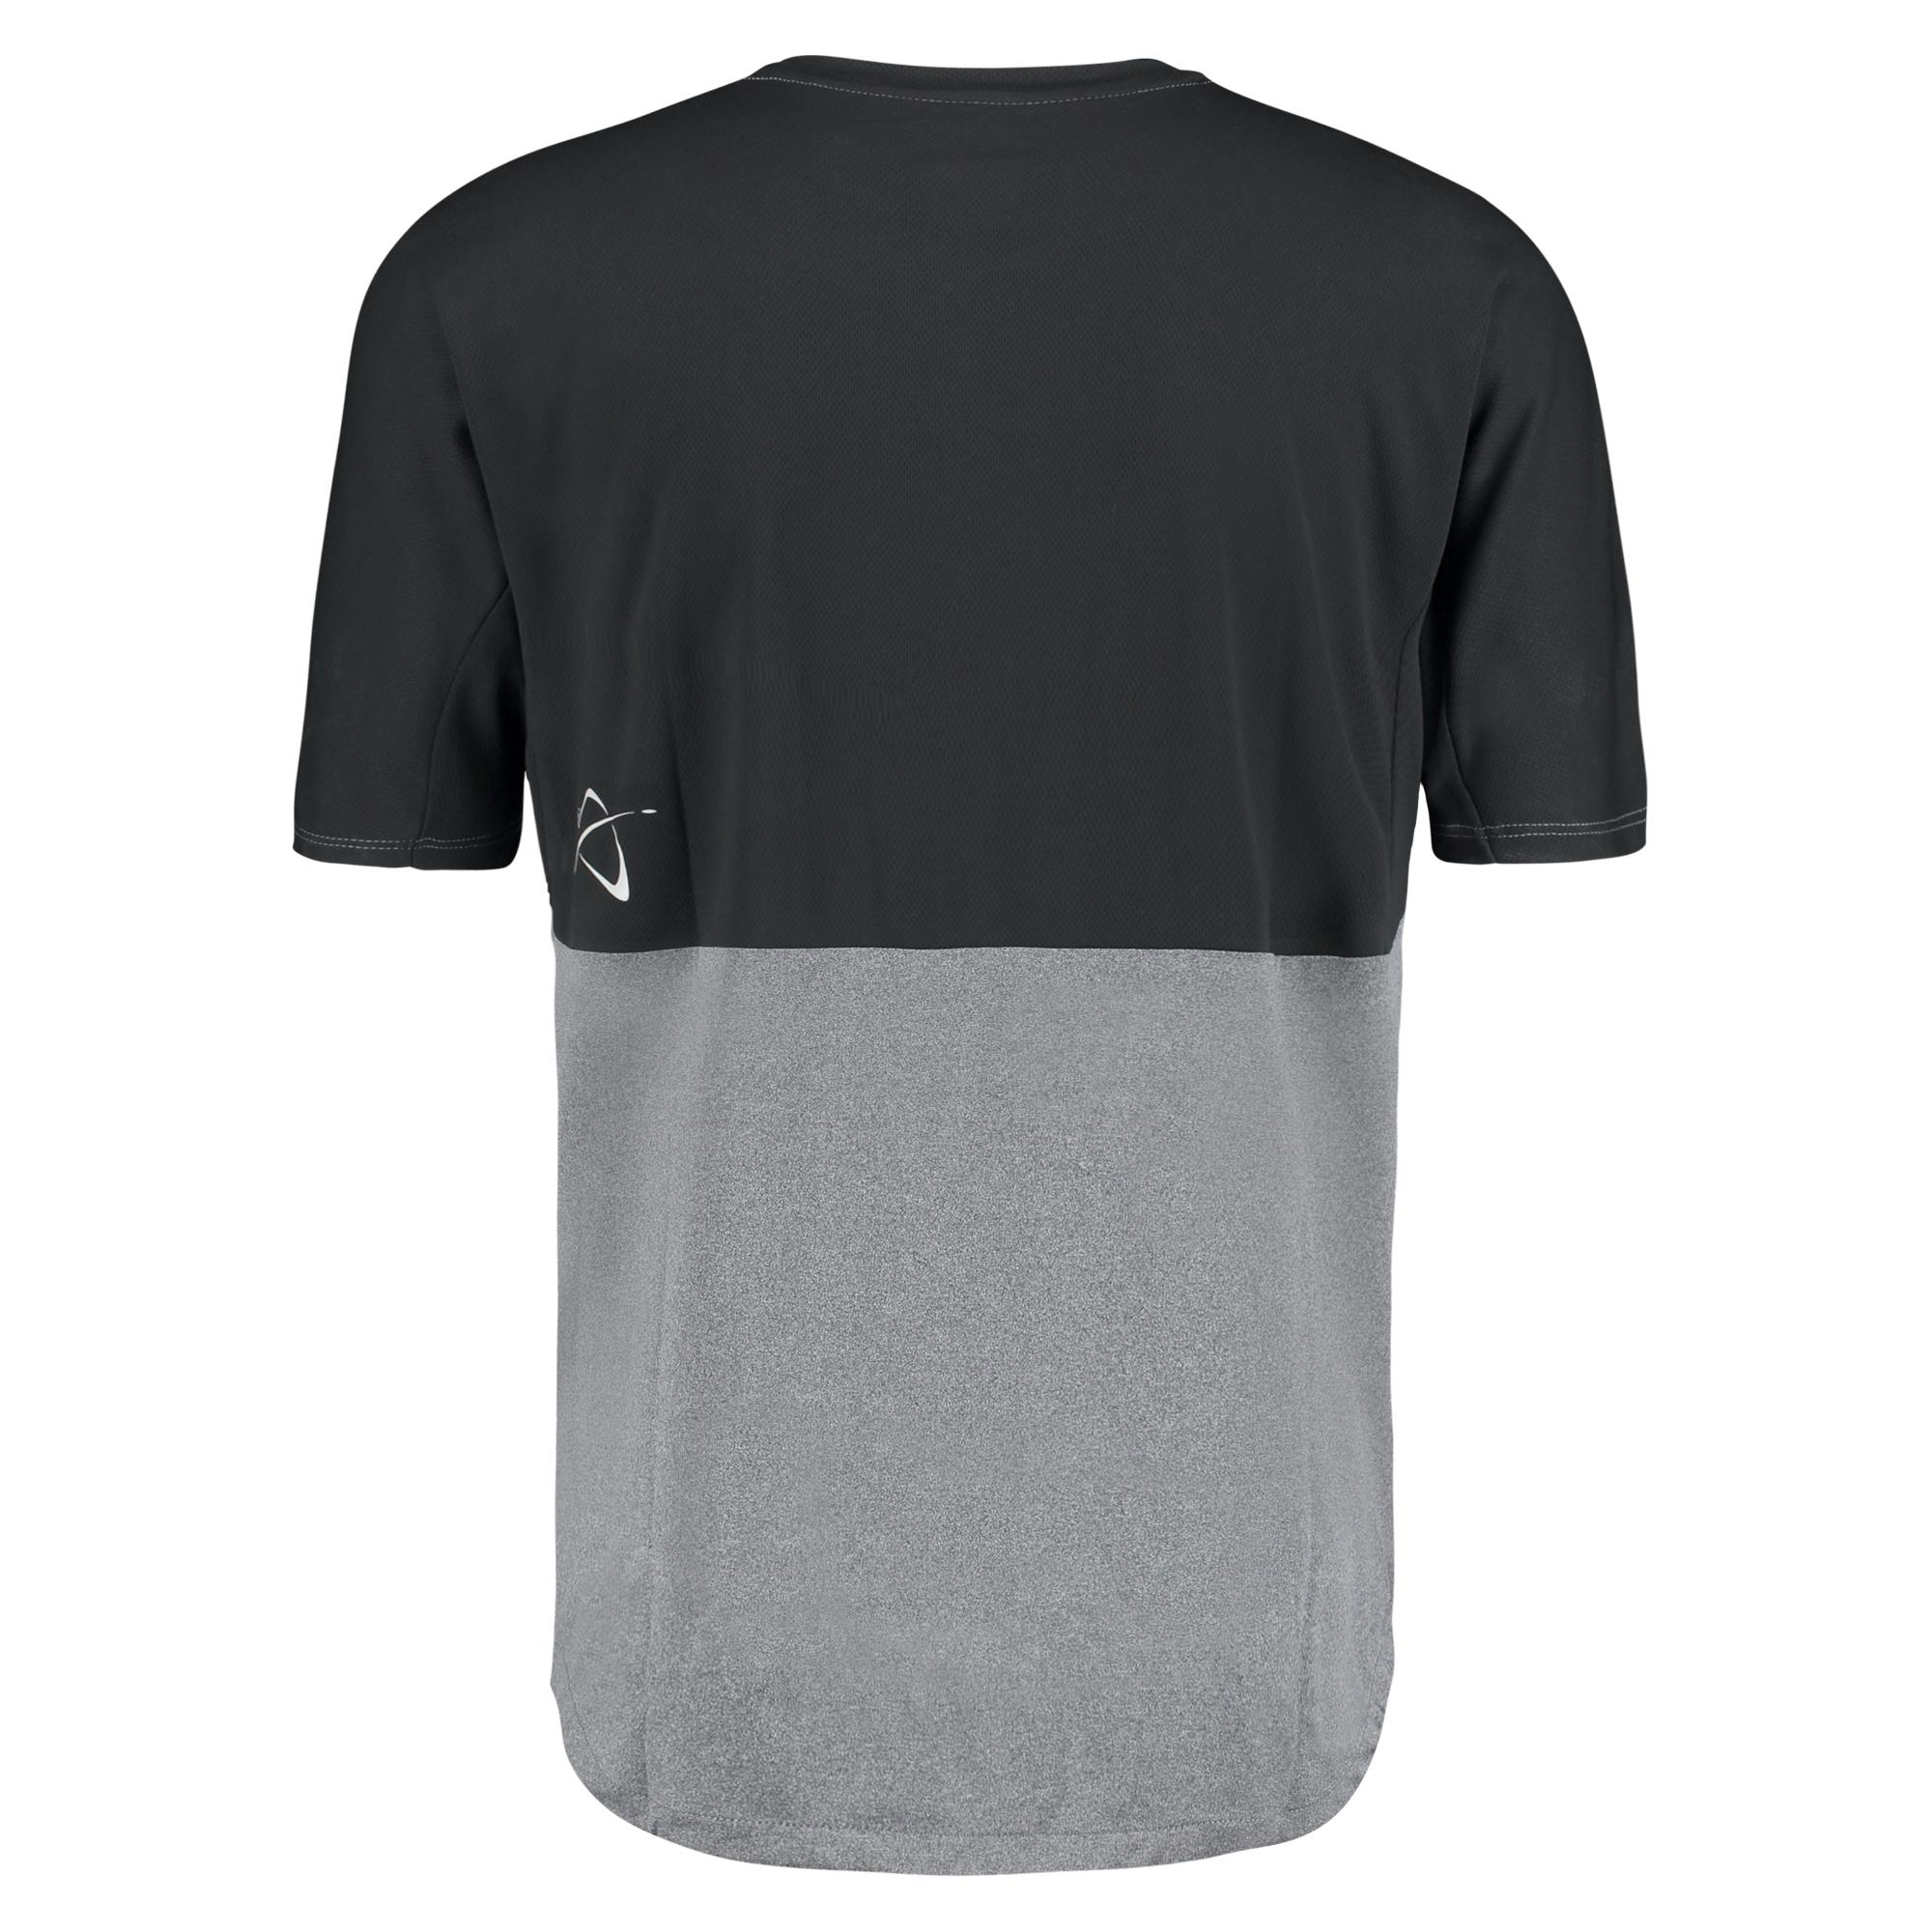 ace top grey back_.jpg